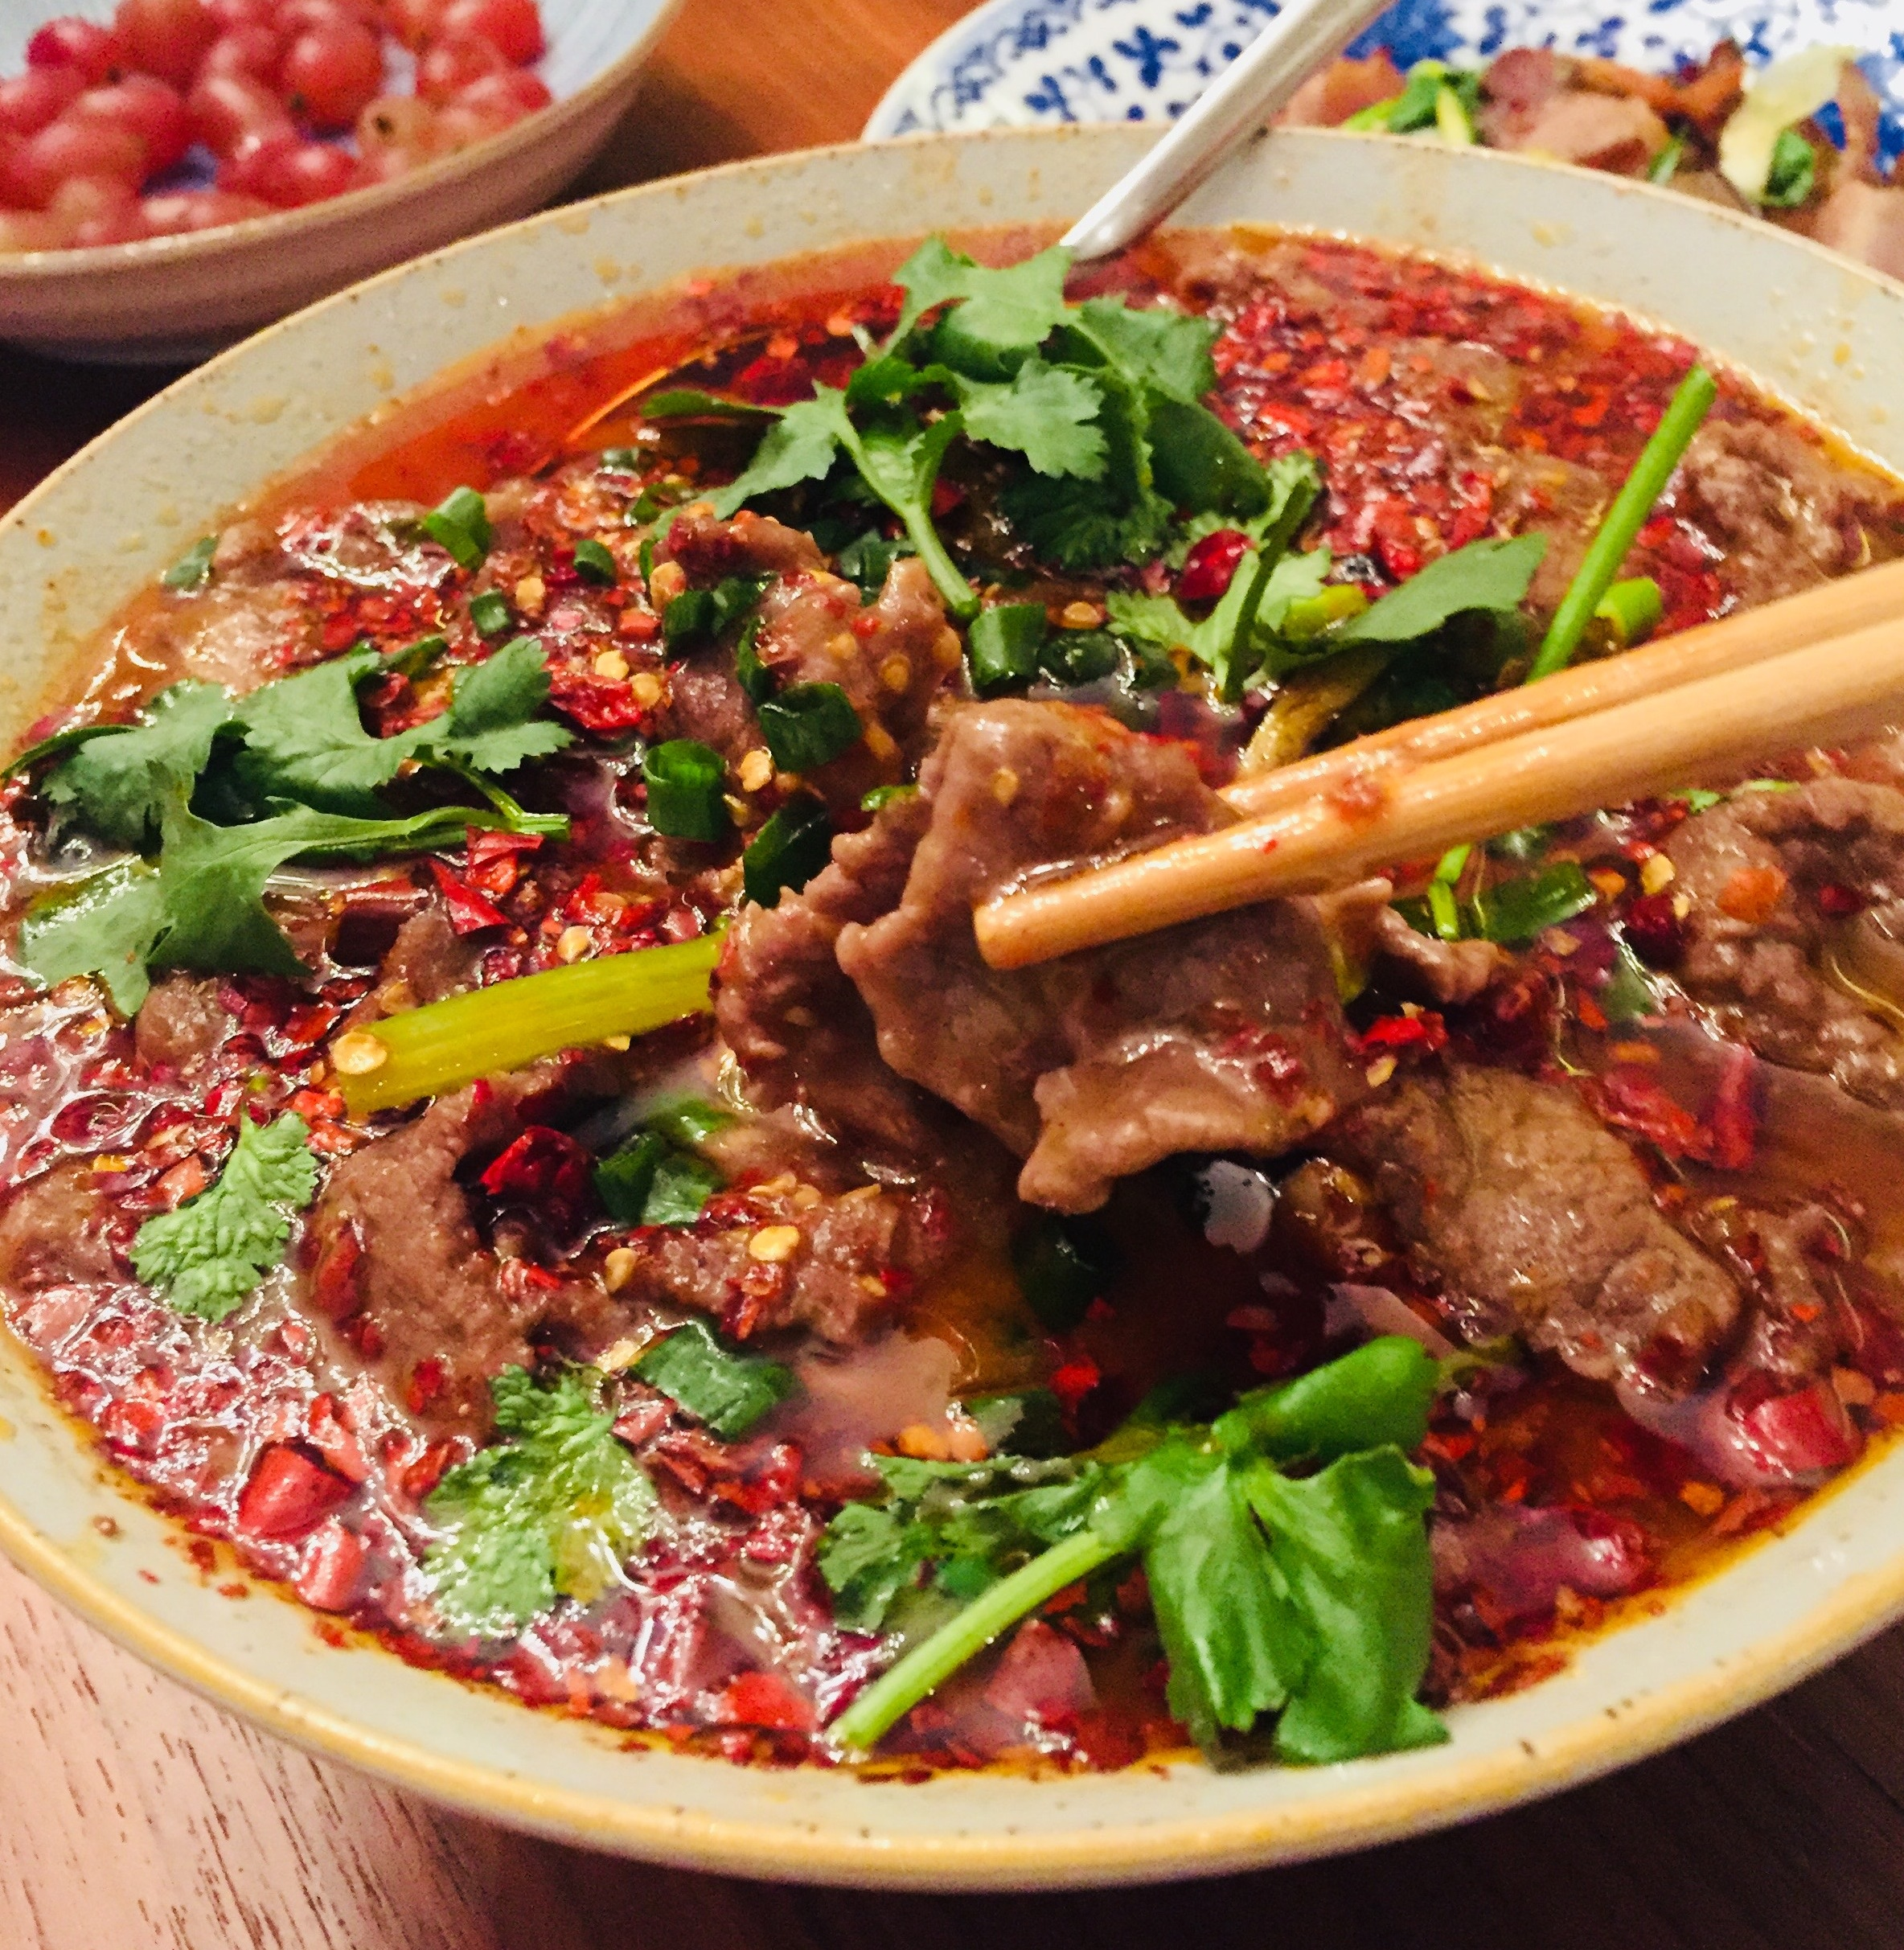 Mala ooh-la-la! Classic Zigong (自贡) dish, boiled beef slices (水煮牛肉).